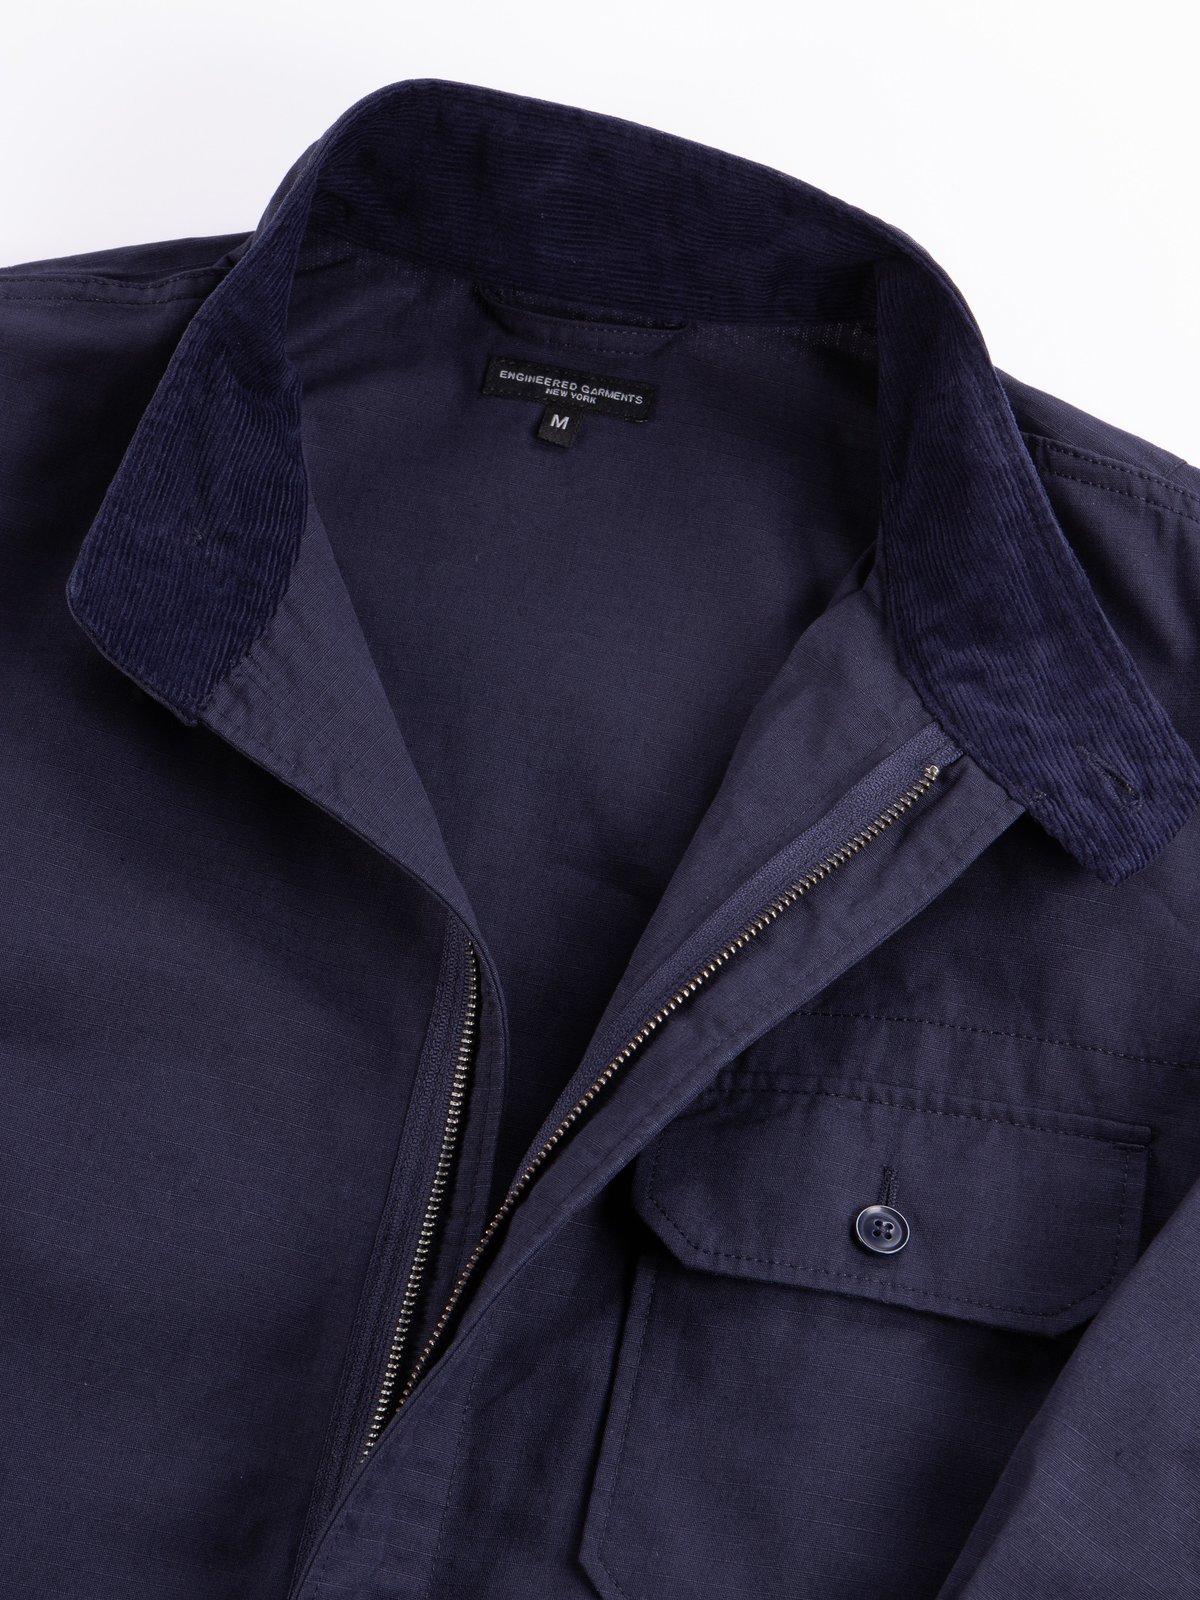 Dark Navy Cotton Ripstop Boiler Suit - Image 6